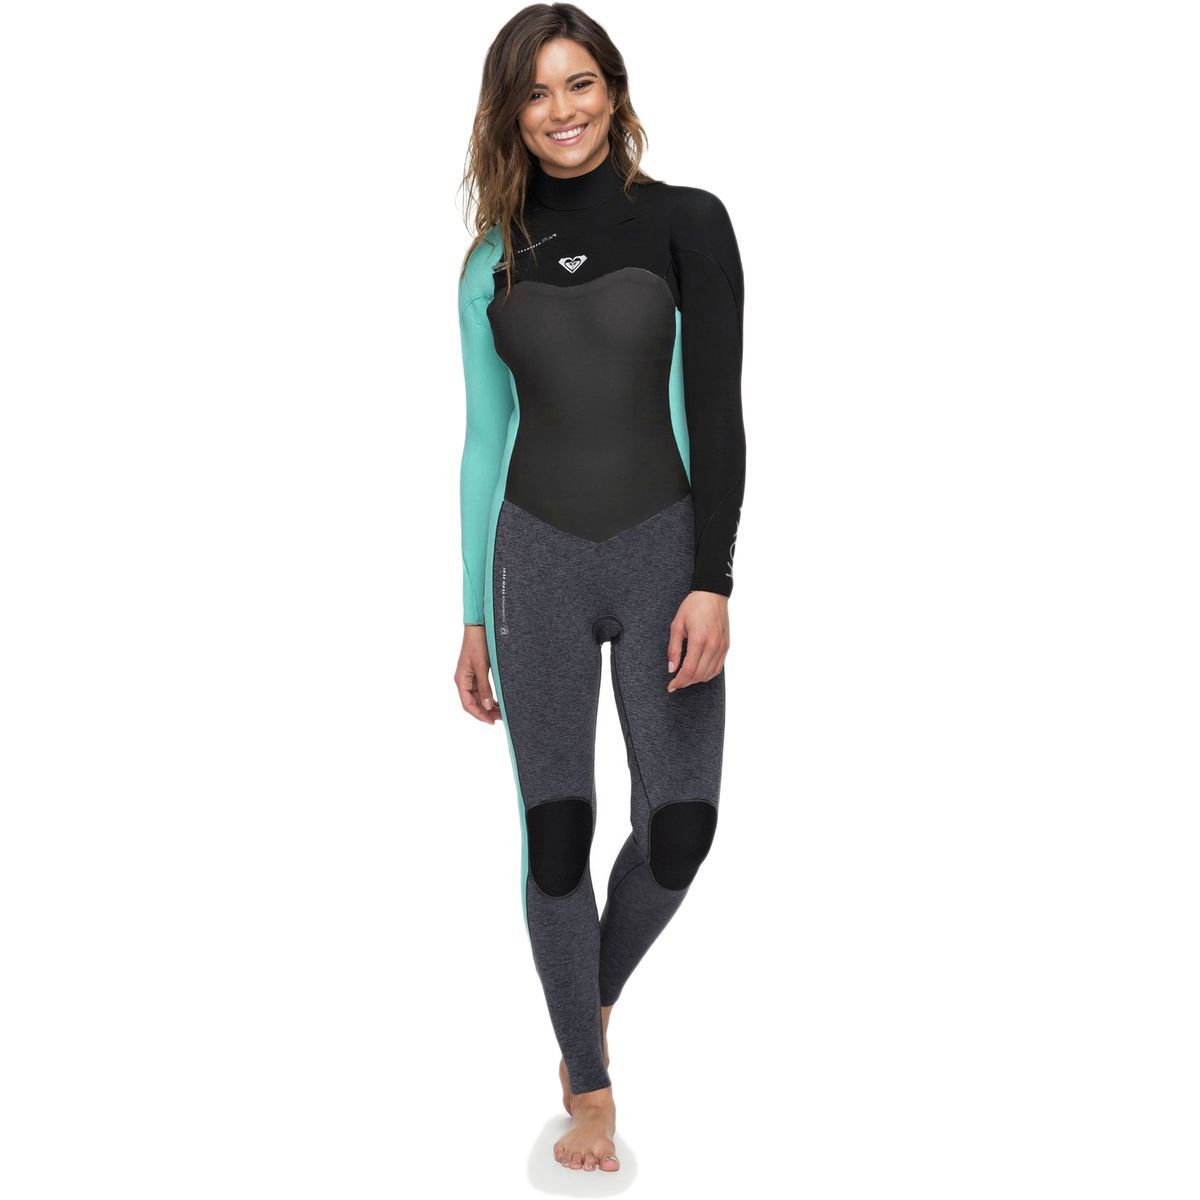 Roxy 3/2 Performance Chest Zip HYD Wetsuit - Women's